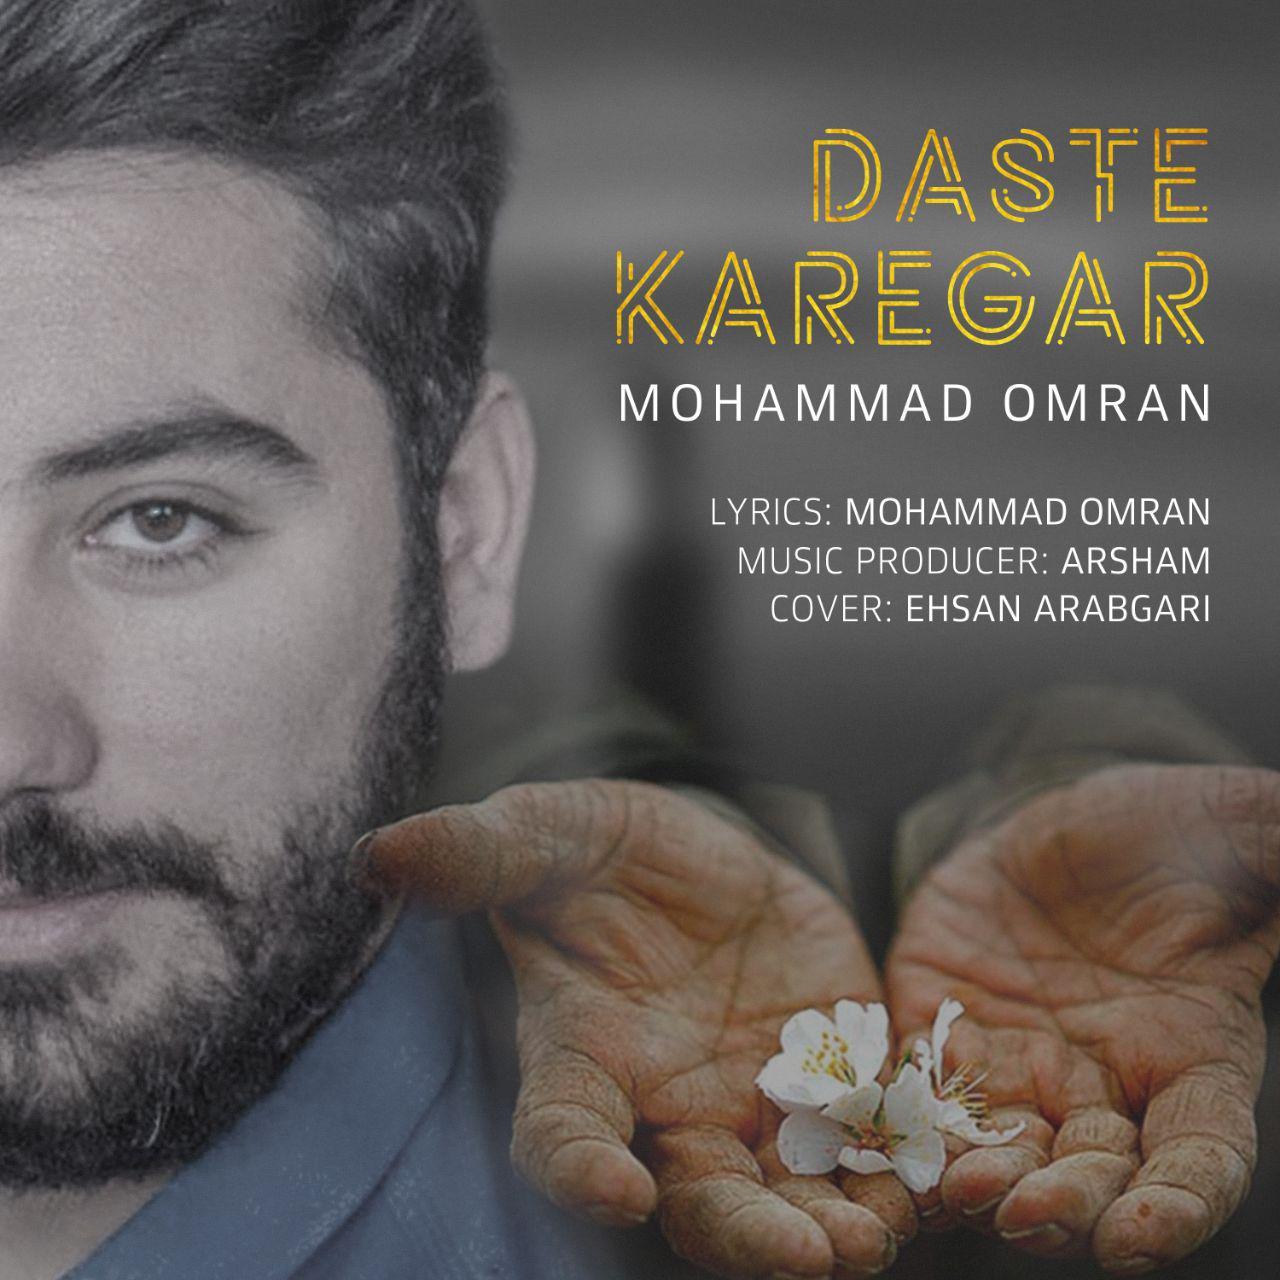 Mohammad Omran – Daste Kargar